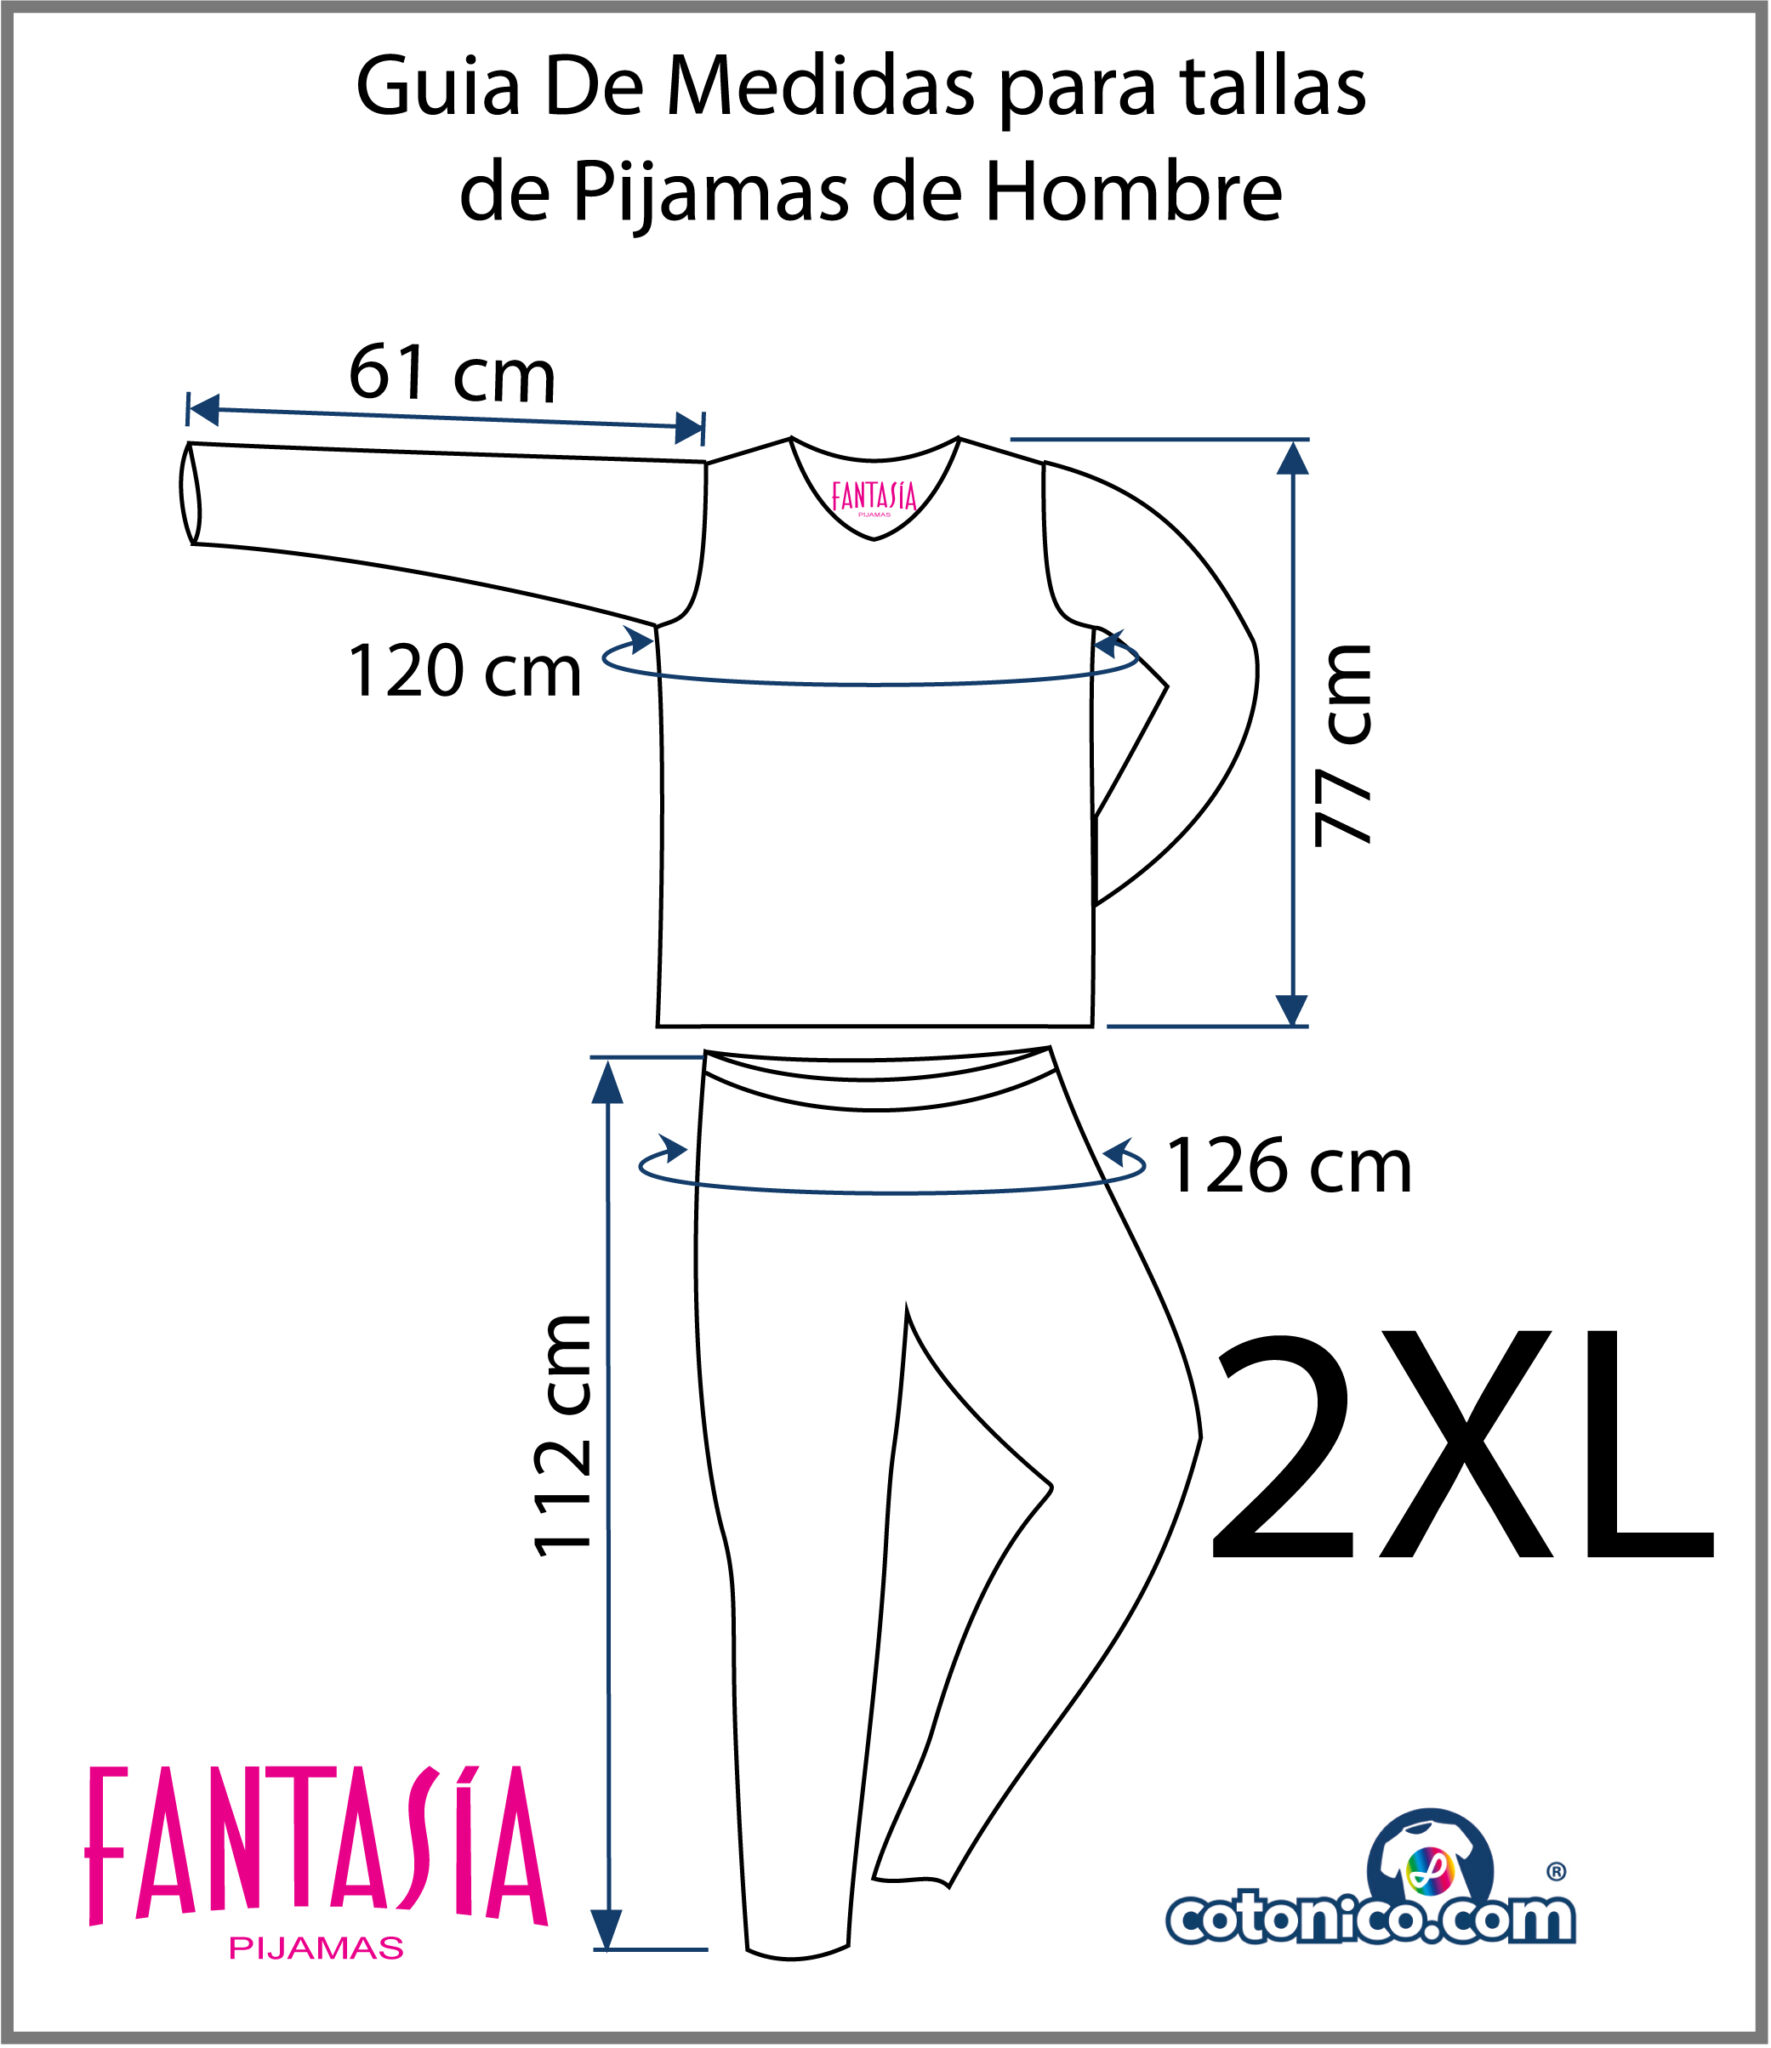 Guia-De-Tallas-Pijamas-De-Hombre-2XL